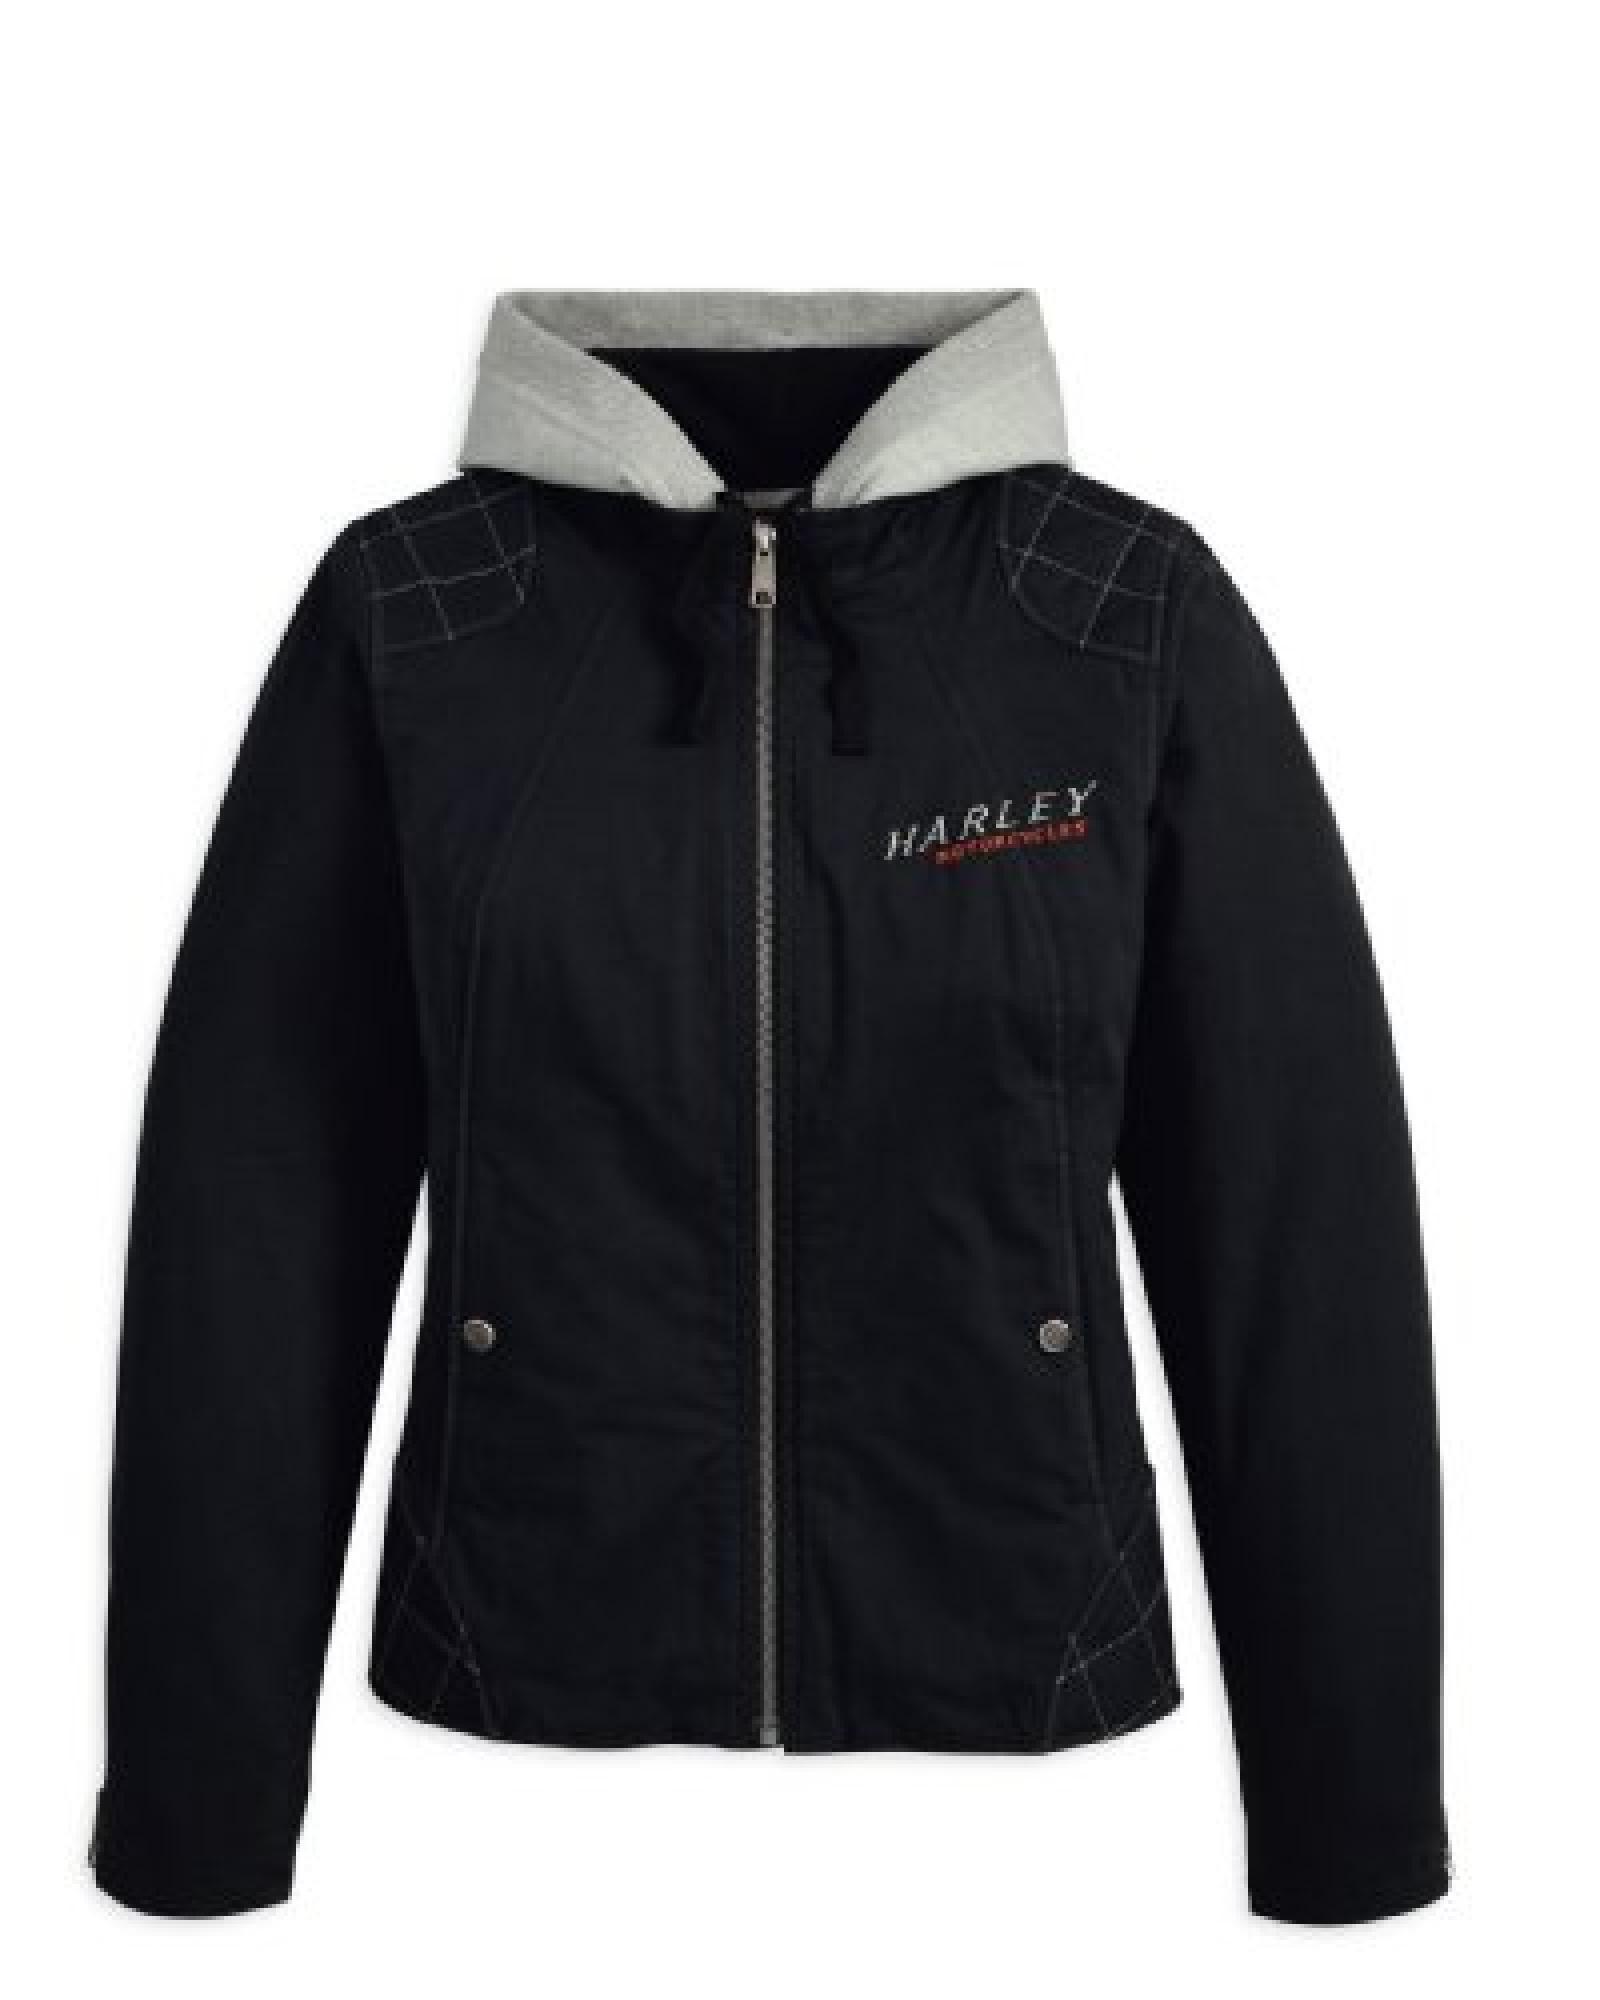 Harley-Davidson Phoenix 3-in-1 Cotton Twill Jacket 97555-13VW Damen Outerwear